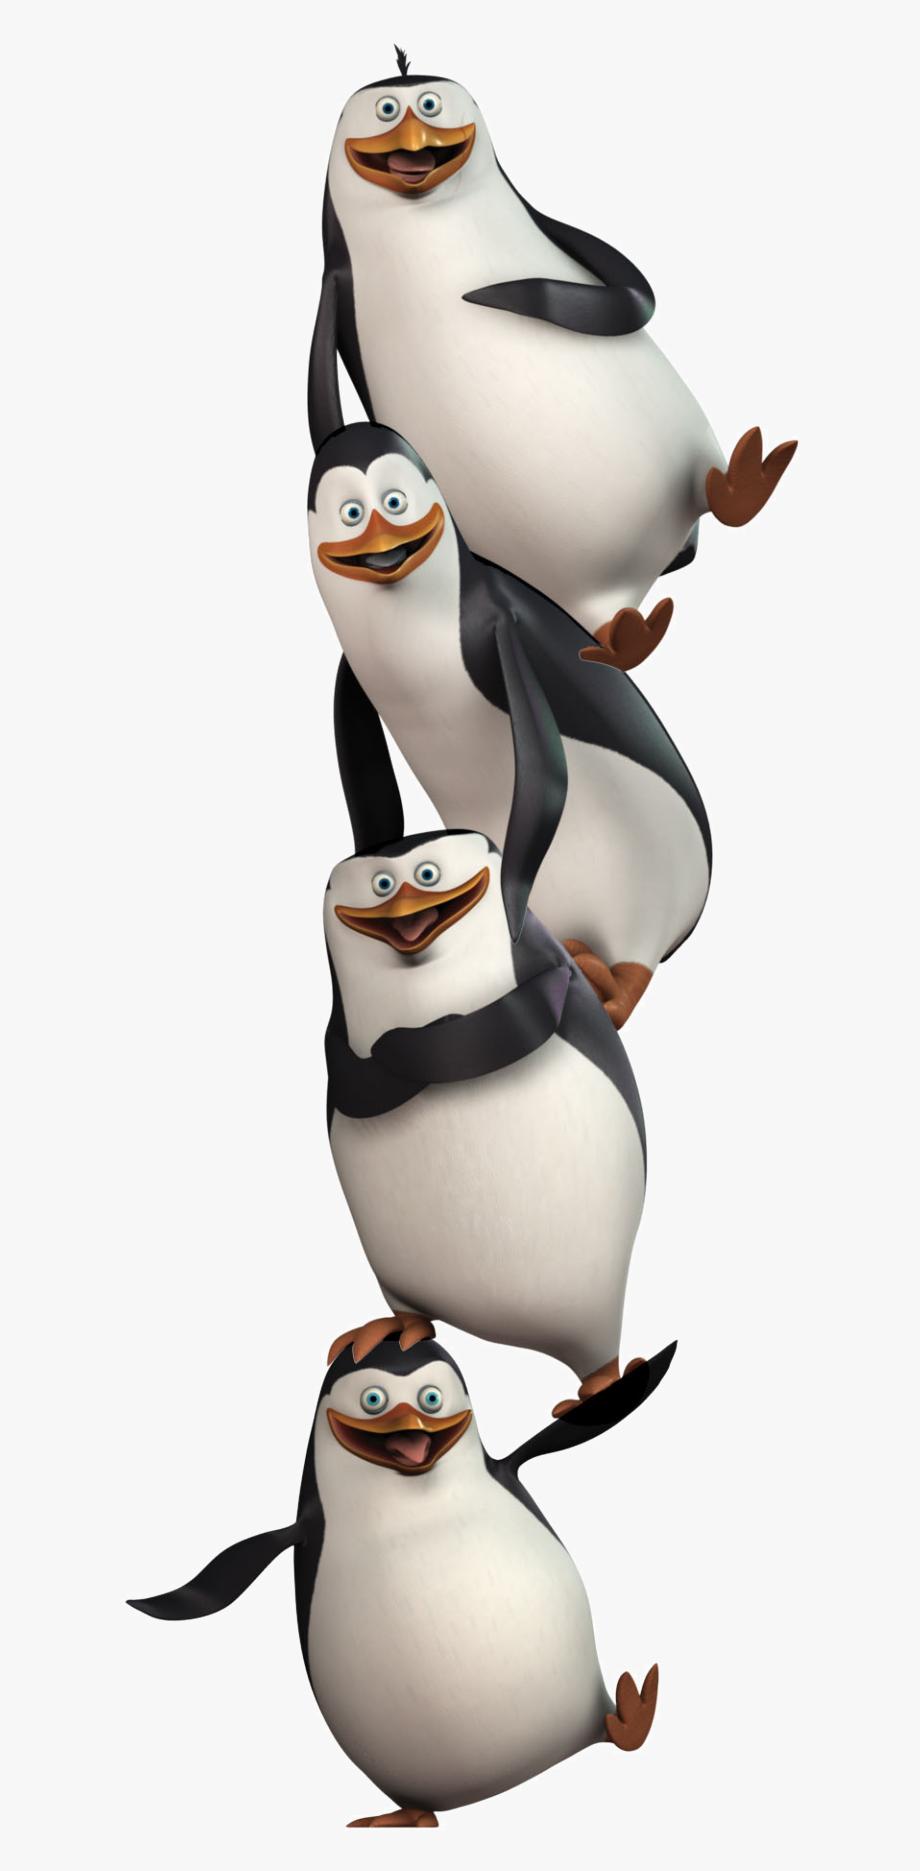 Penguins . Clipart penquin penguin madagascar